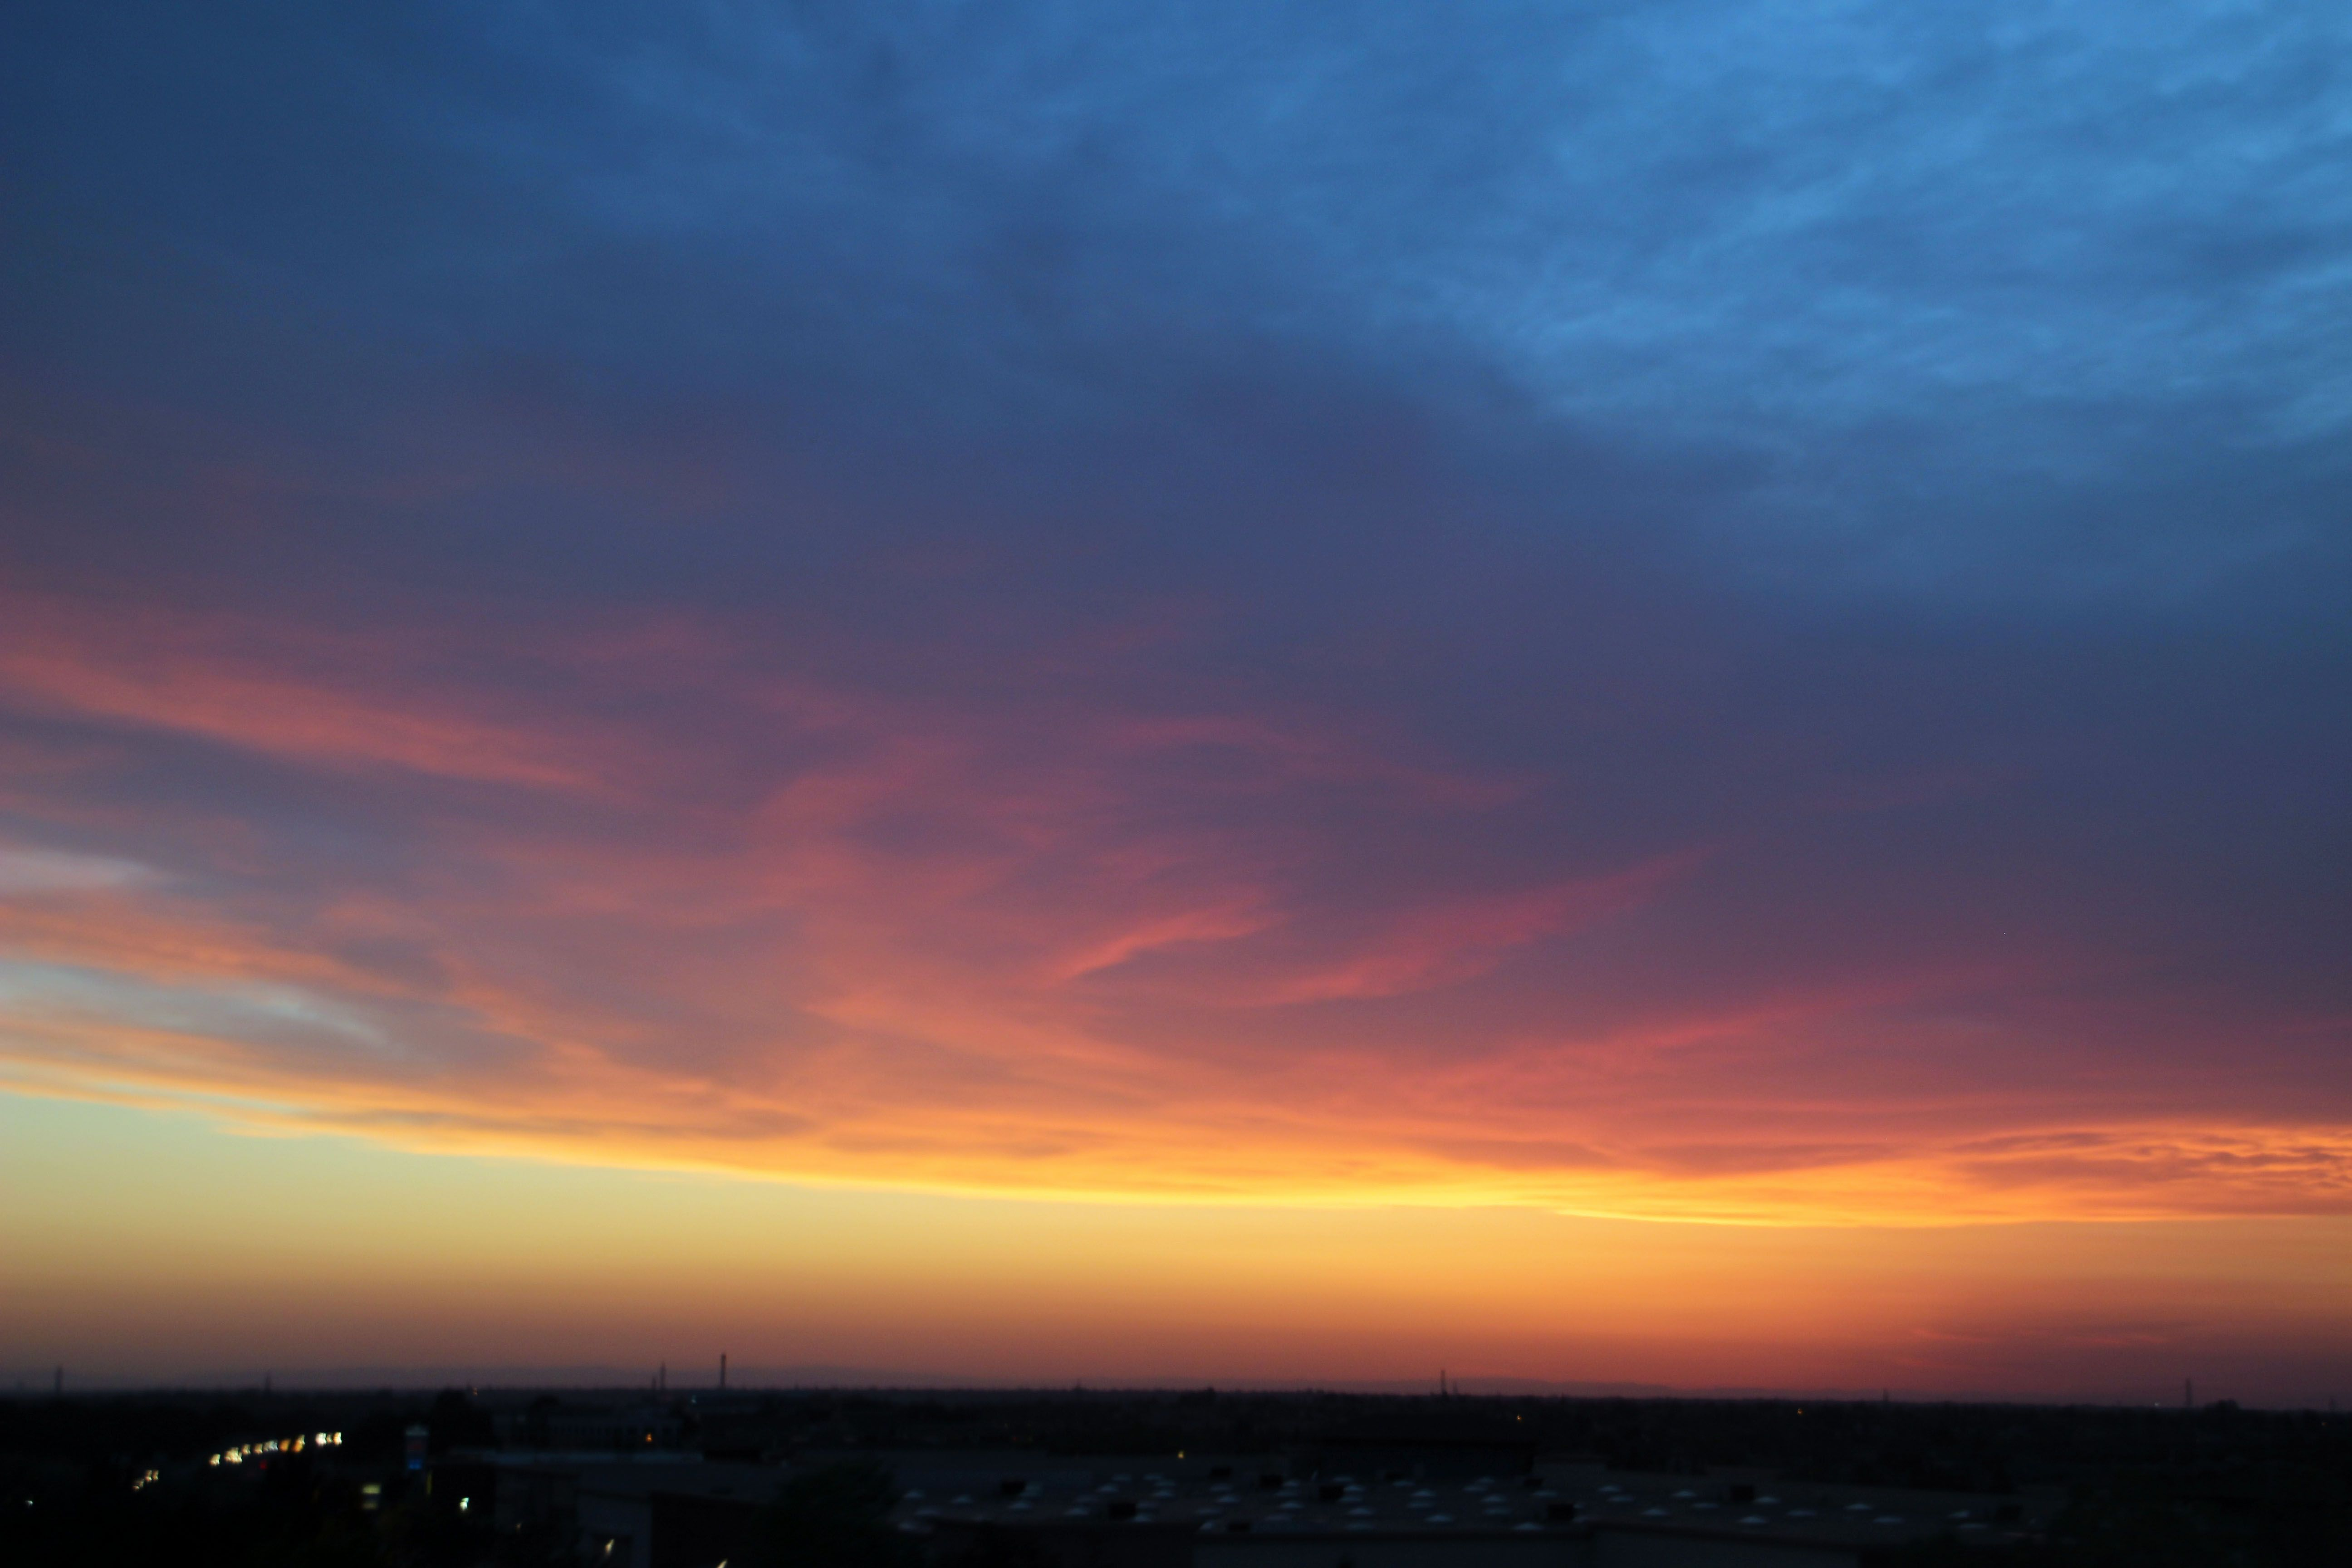 SunsetColored Pencil_0726